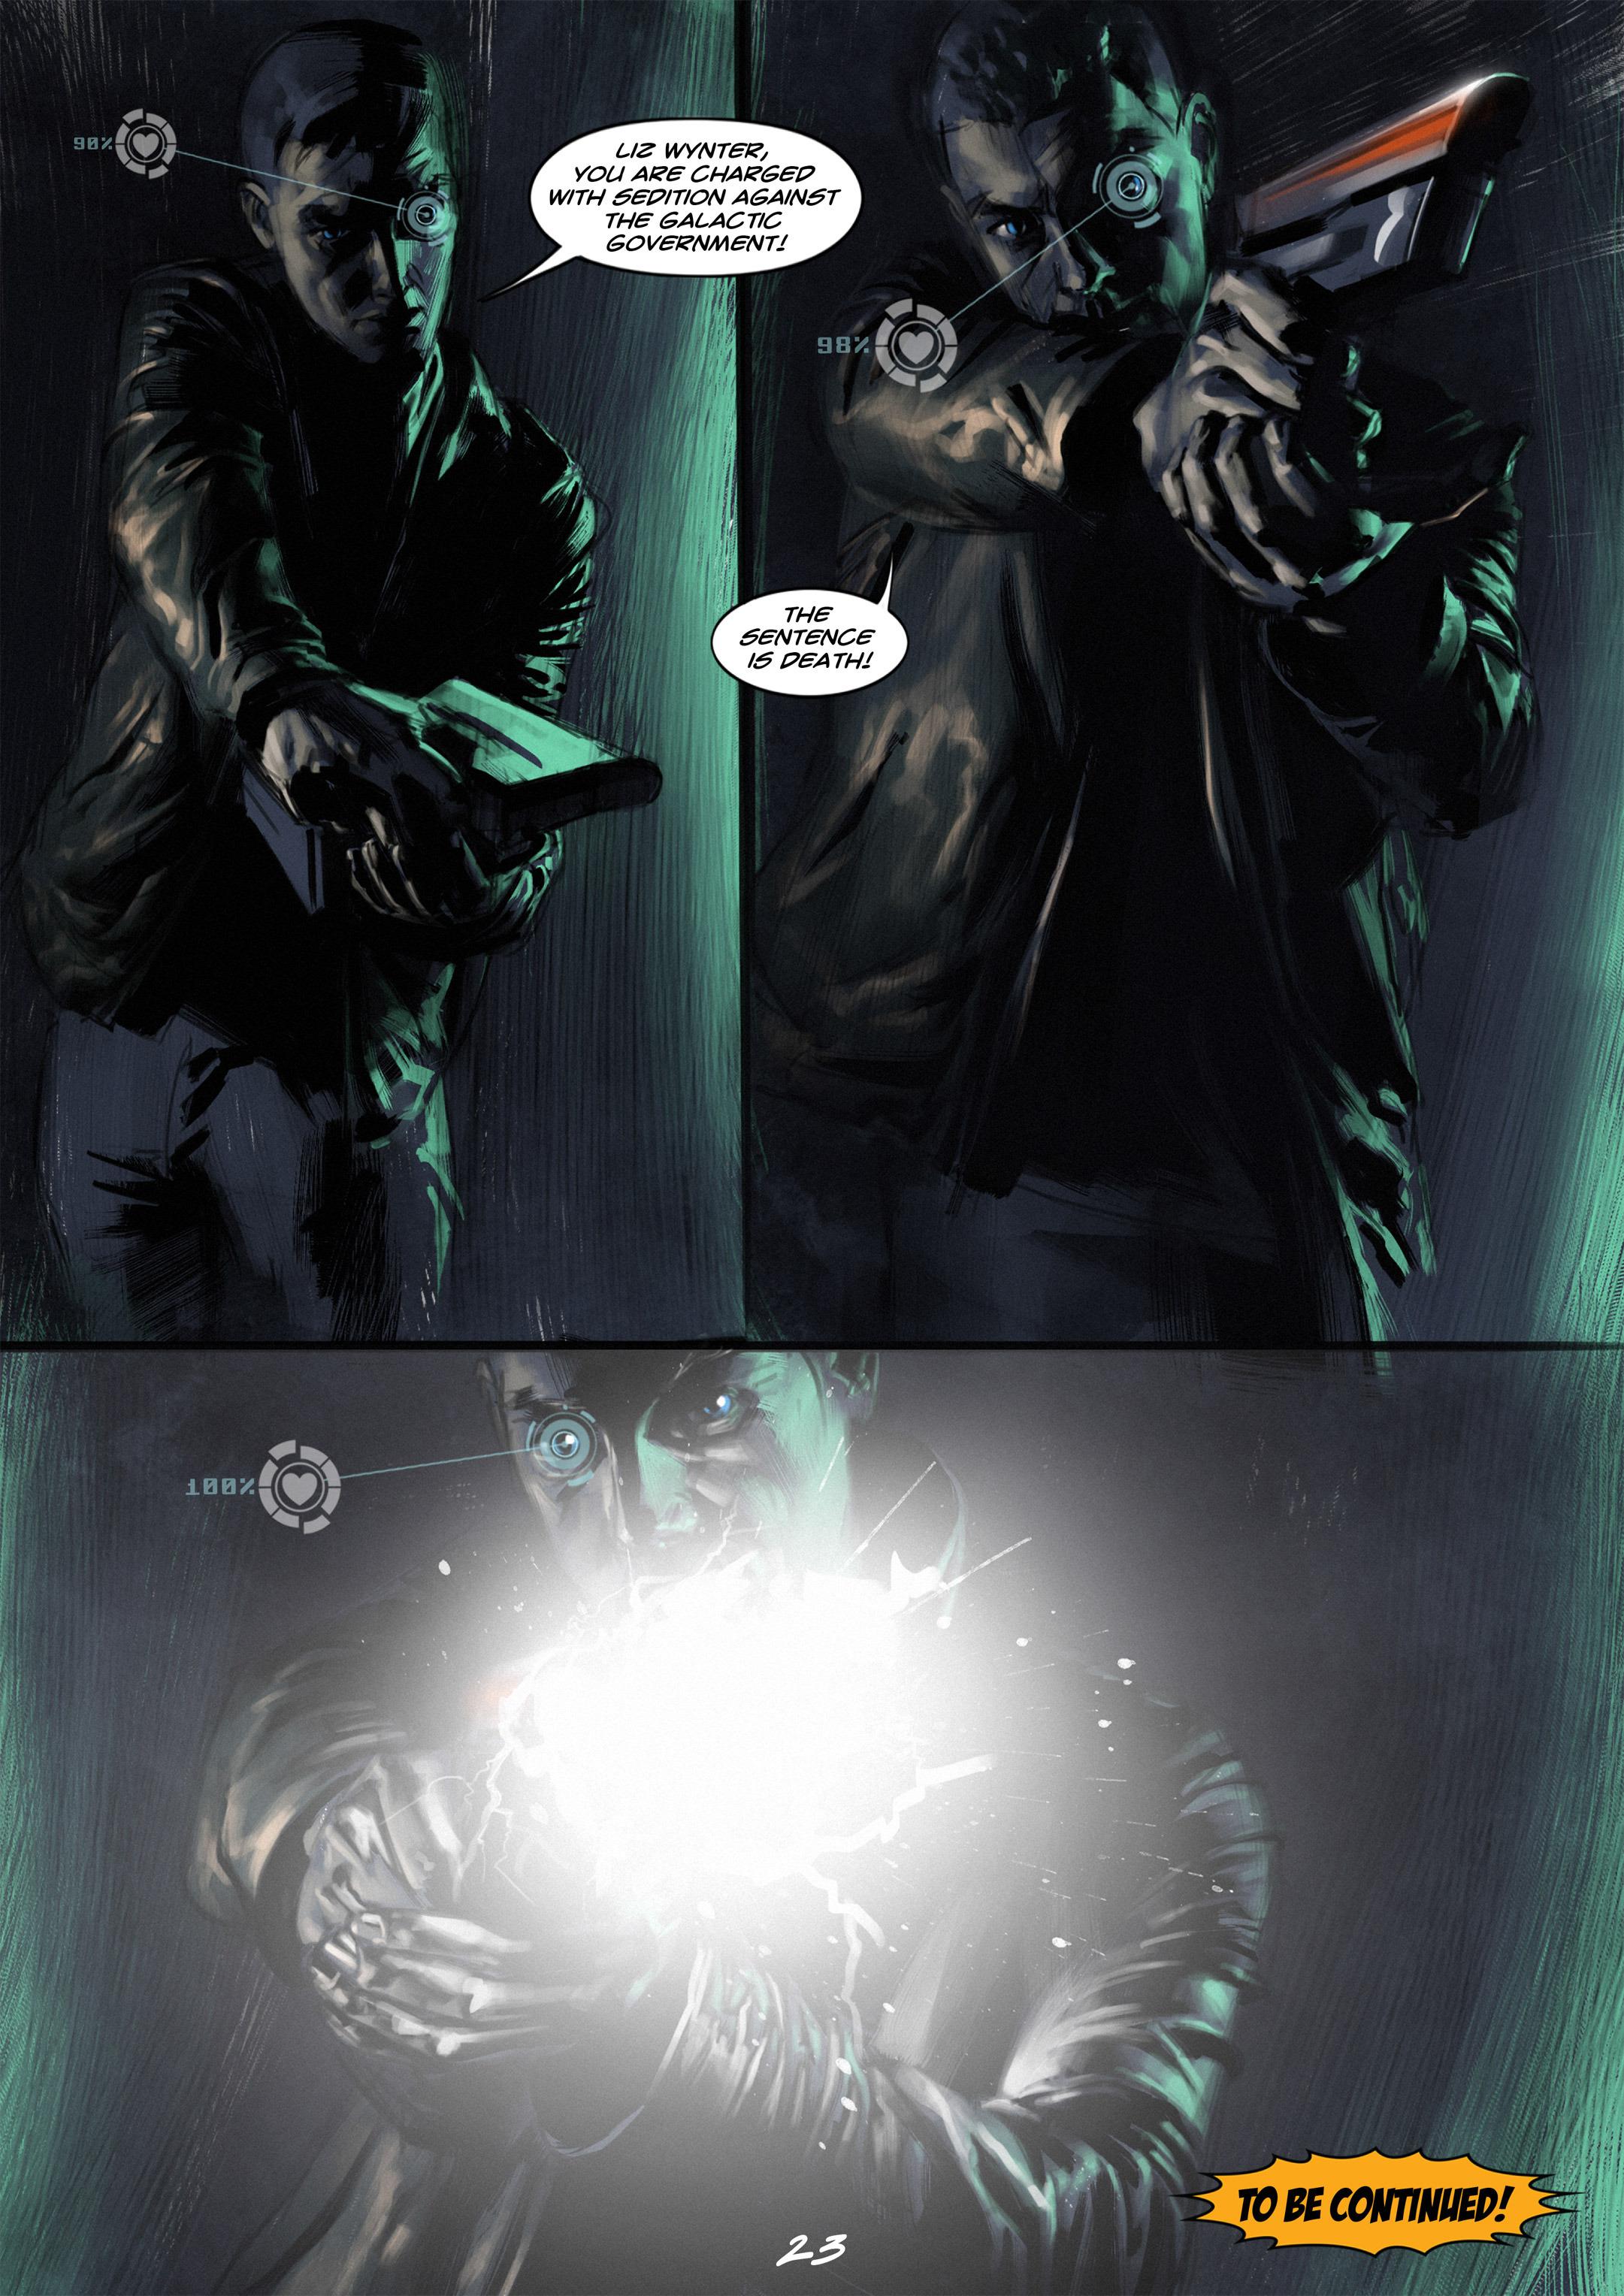 Read online Wynter comic -  Issue #2 - 23